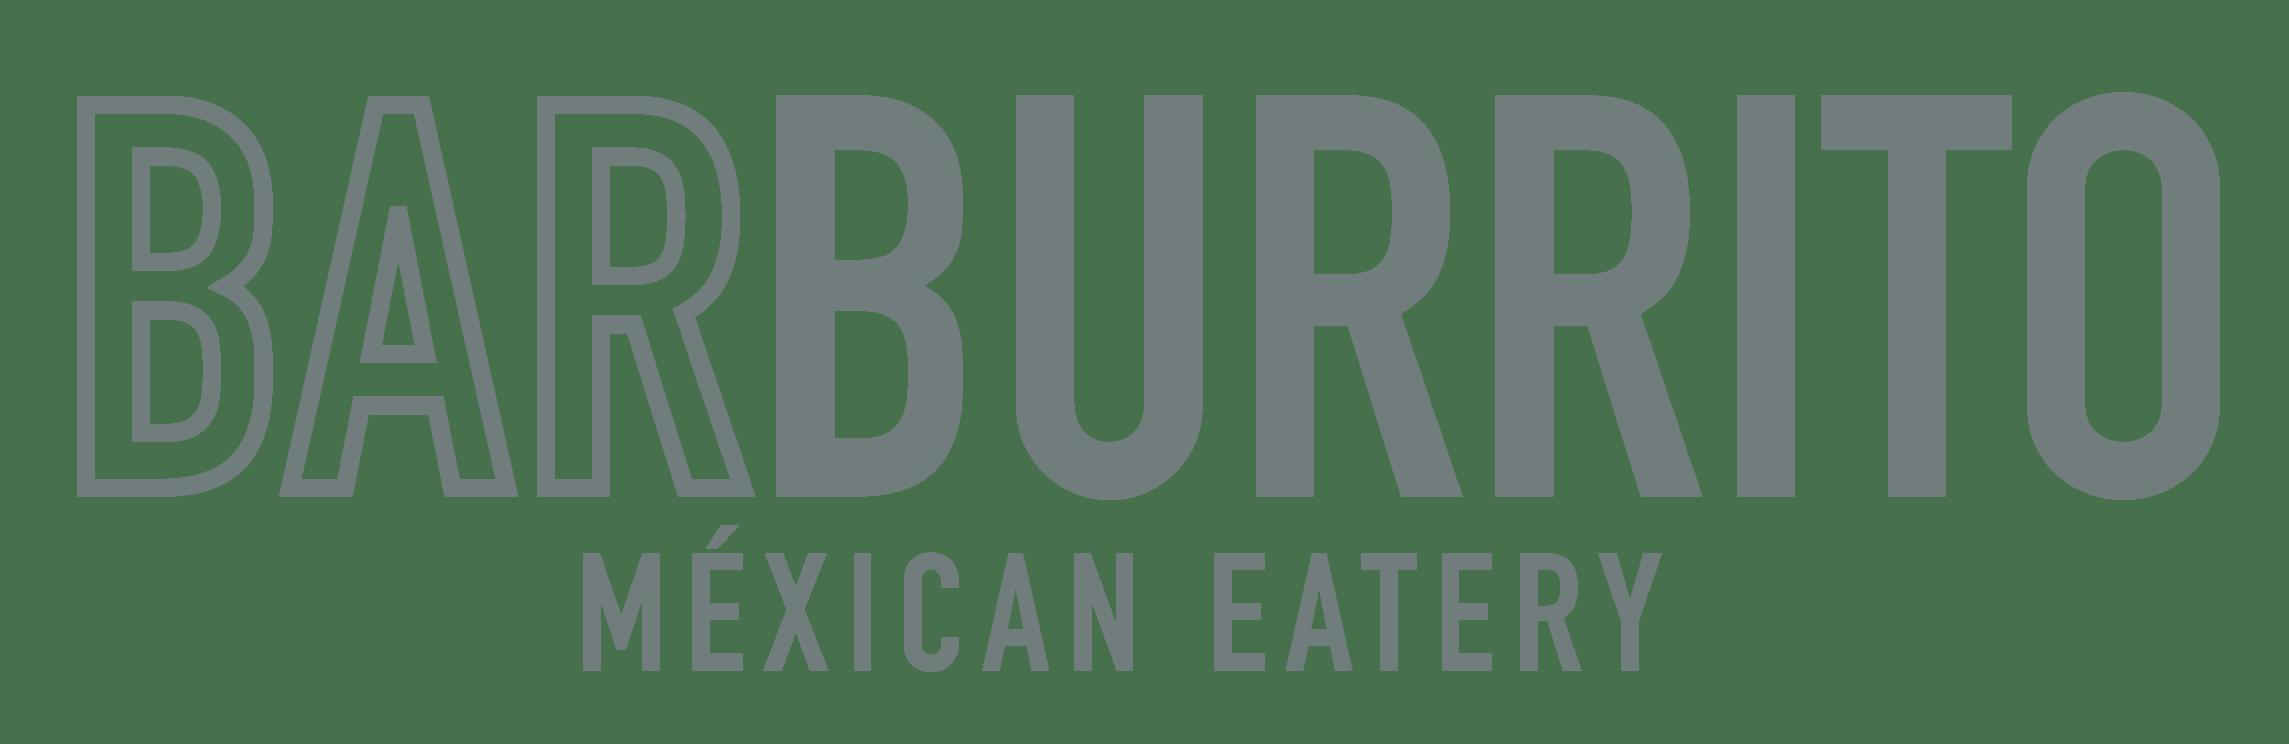 Barburrito Mexican Eatery Logo